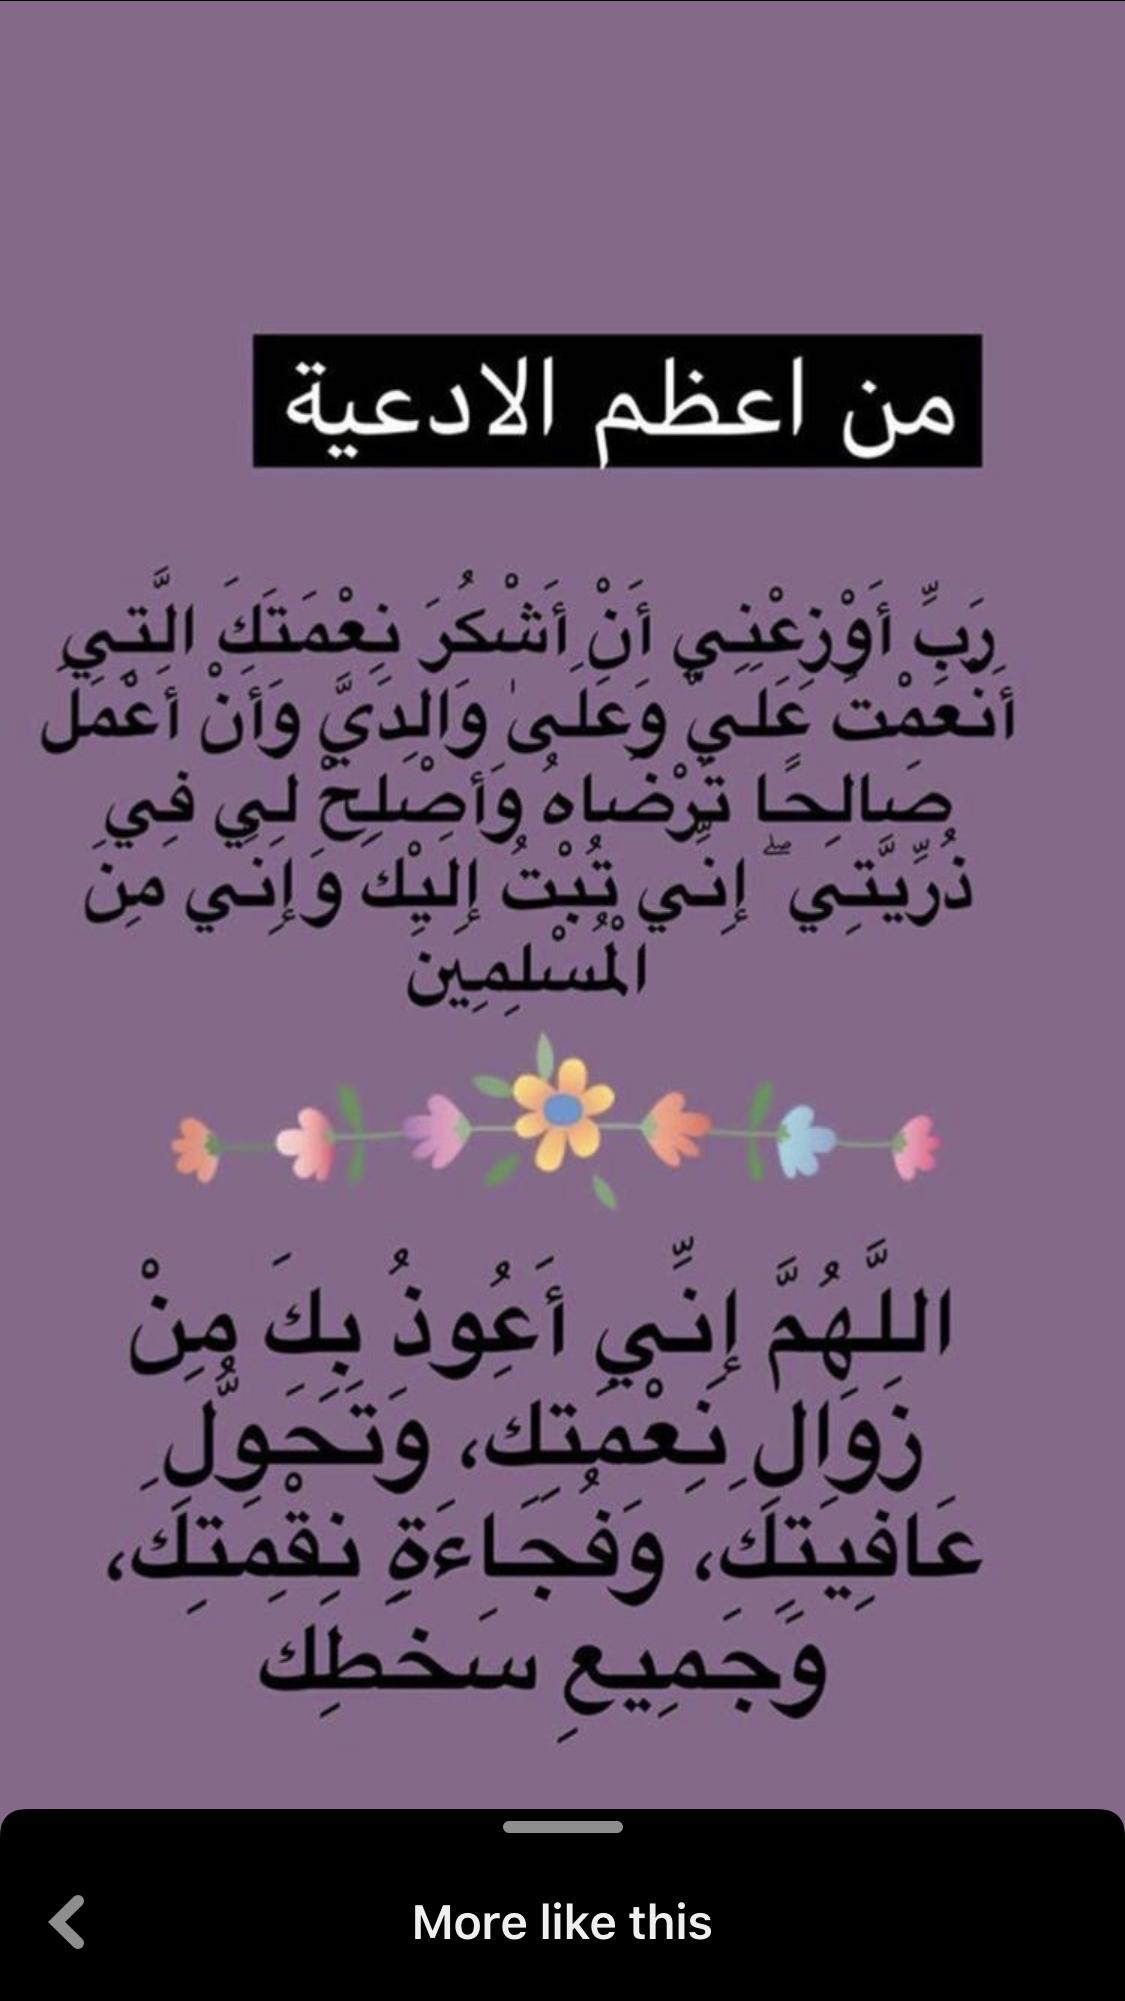 Pin By Bakr Harrass On الهندسة المعمارية Islamic Inspirational Quotes Islamic Phrases Quran Quotes